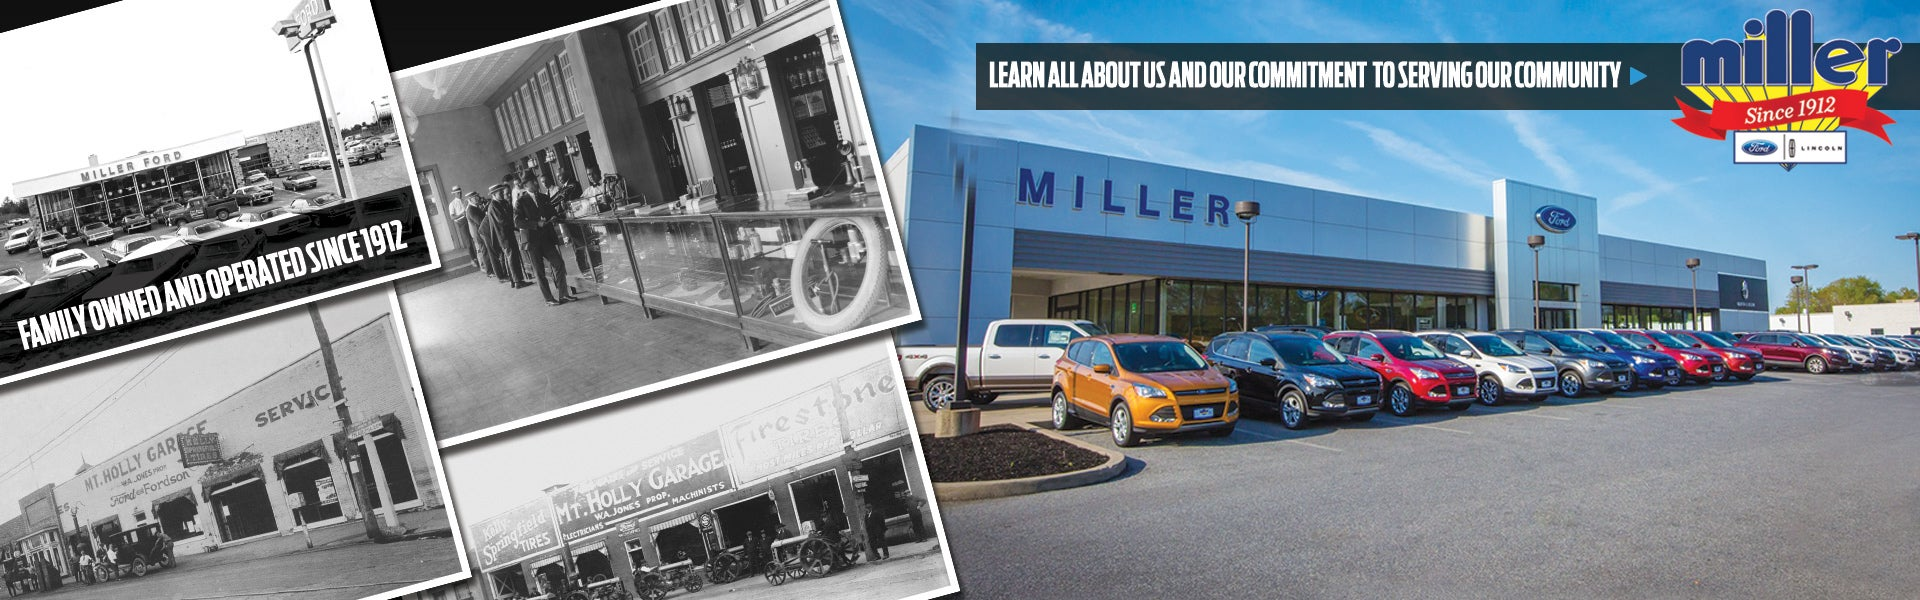 Ford Dealers Nj >> Ford Dealer In Lumberton Nj Used Cars Lumberton Miller Ford